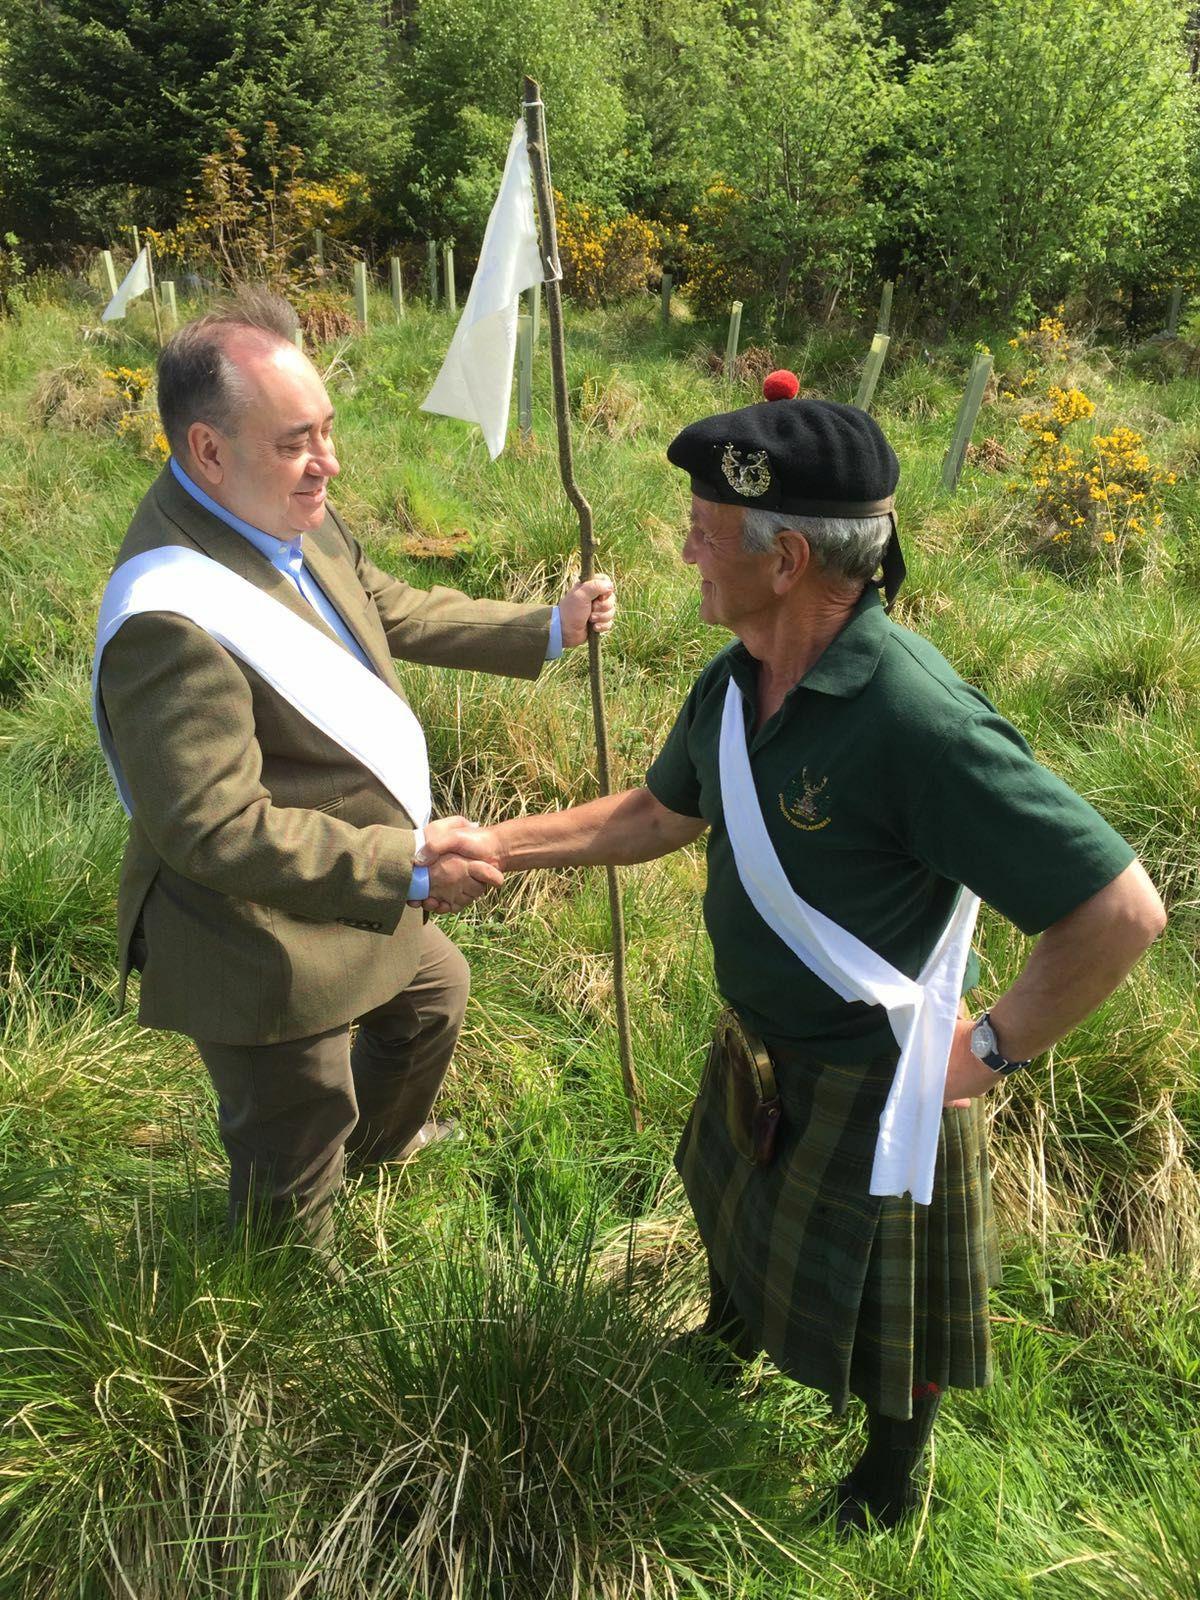 Alex Salmond meeting retired Gordon Highlander Maj. Mike Taitt at the White Wood in Huntly.